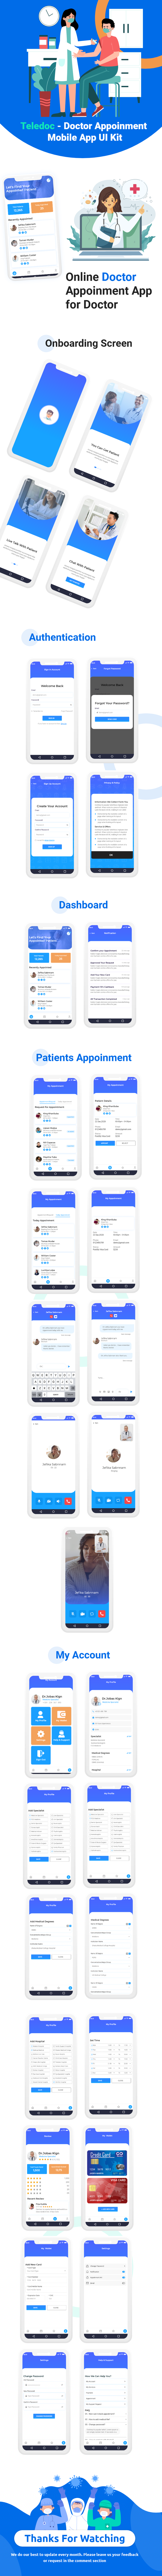 Teledoc - Doctor Appoinment Mobile App UI Kit - 2